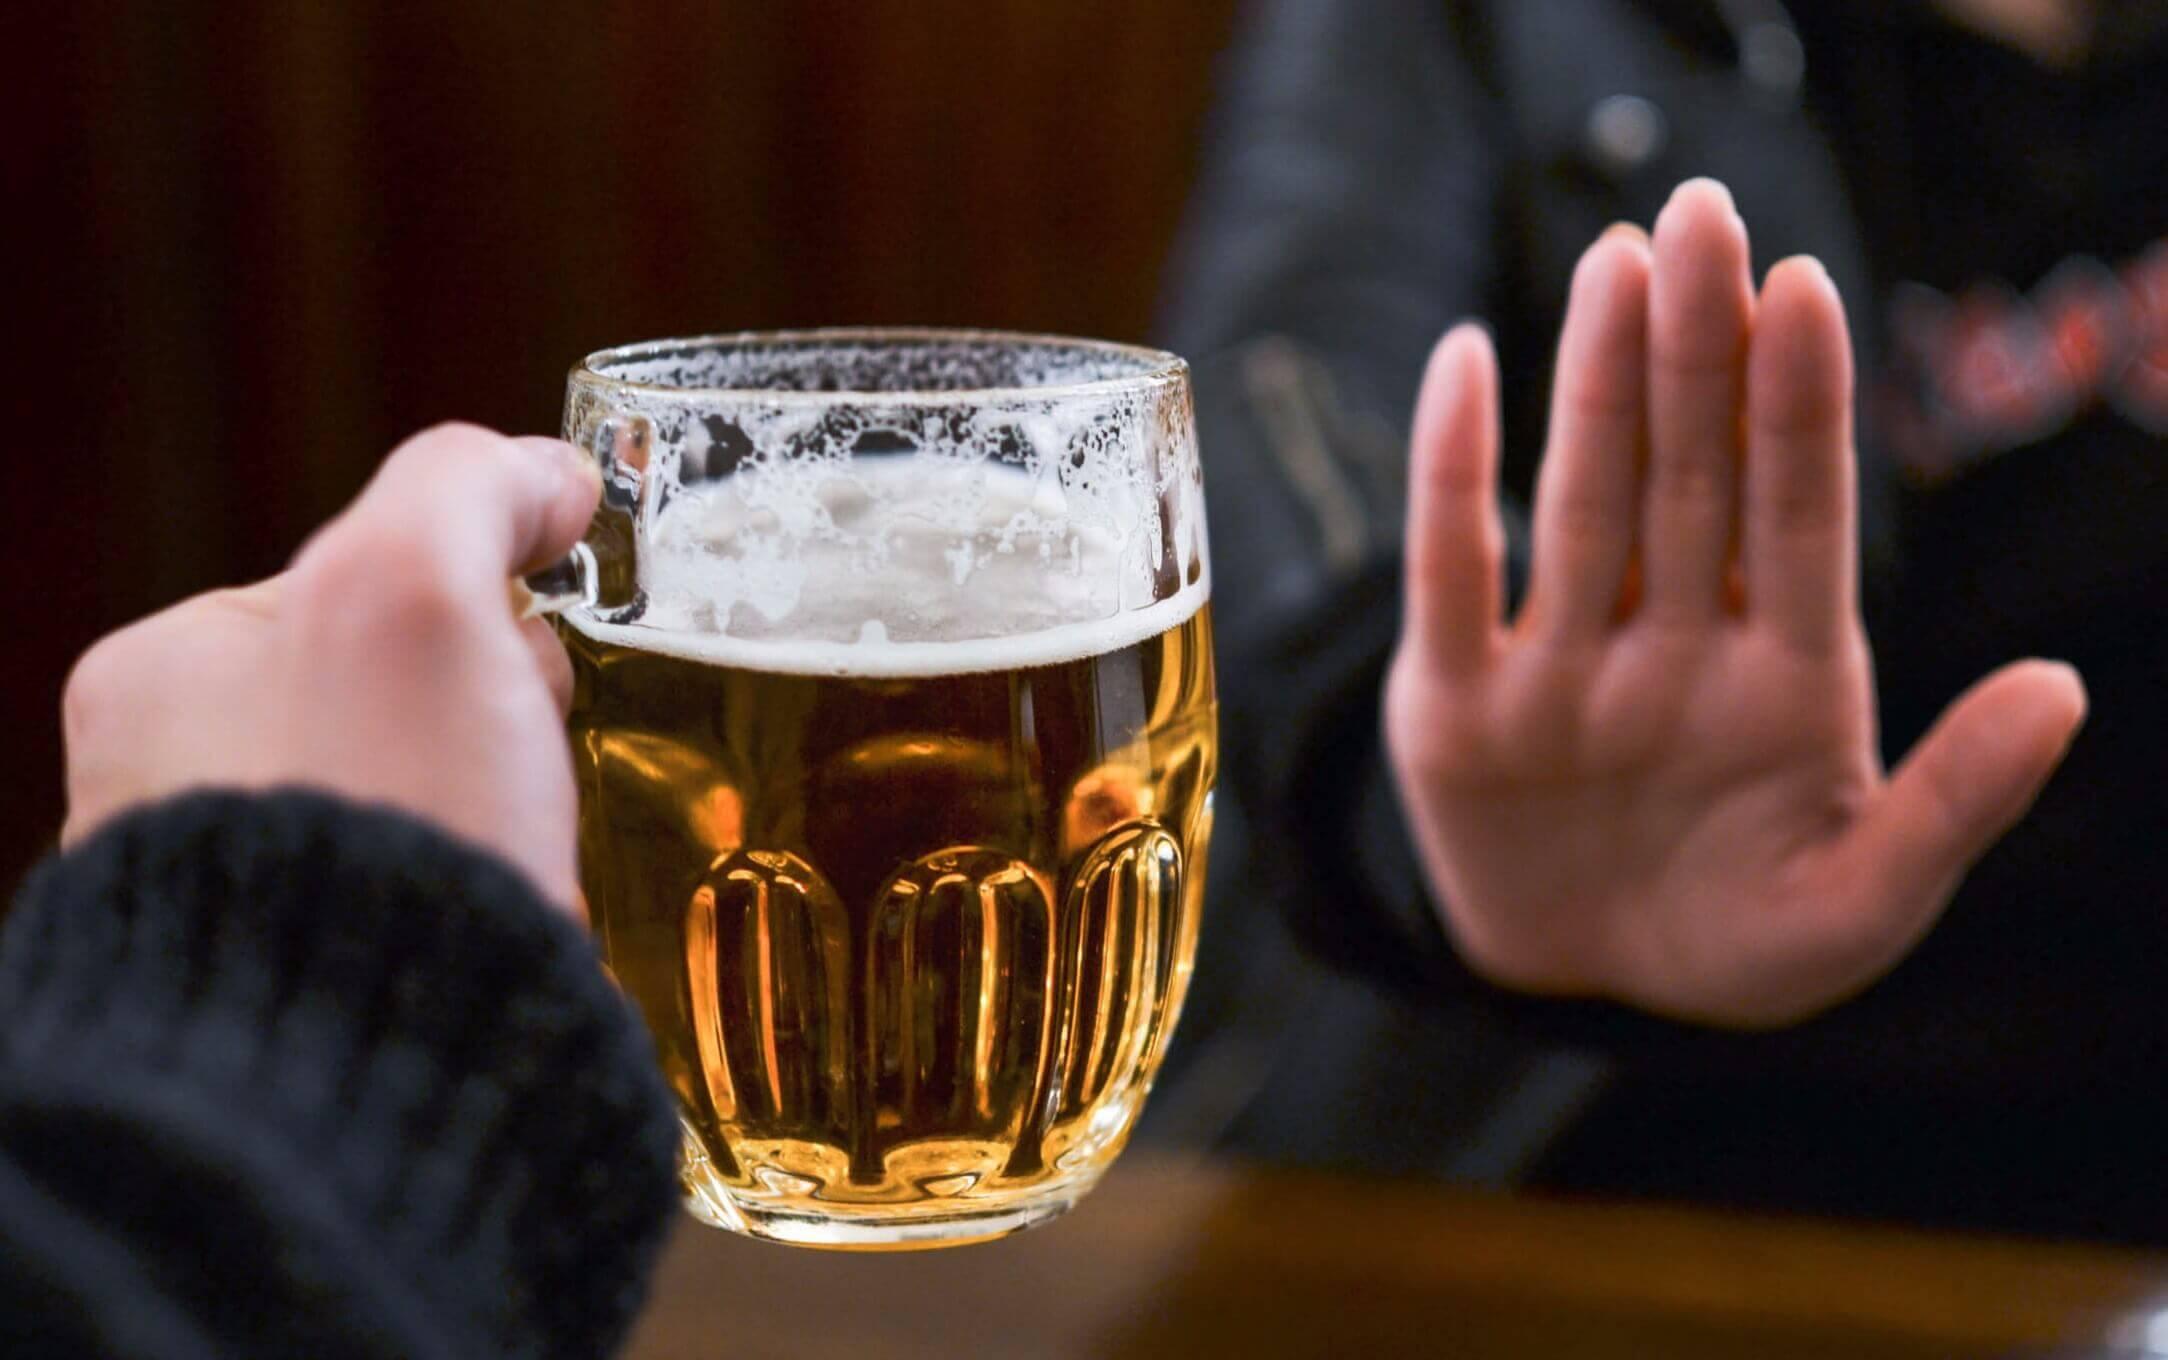 Alcohol makes you less alert